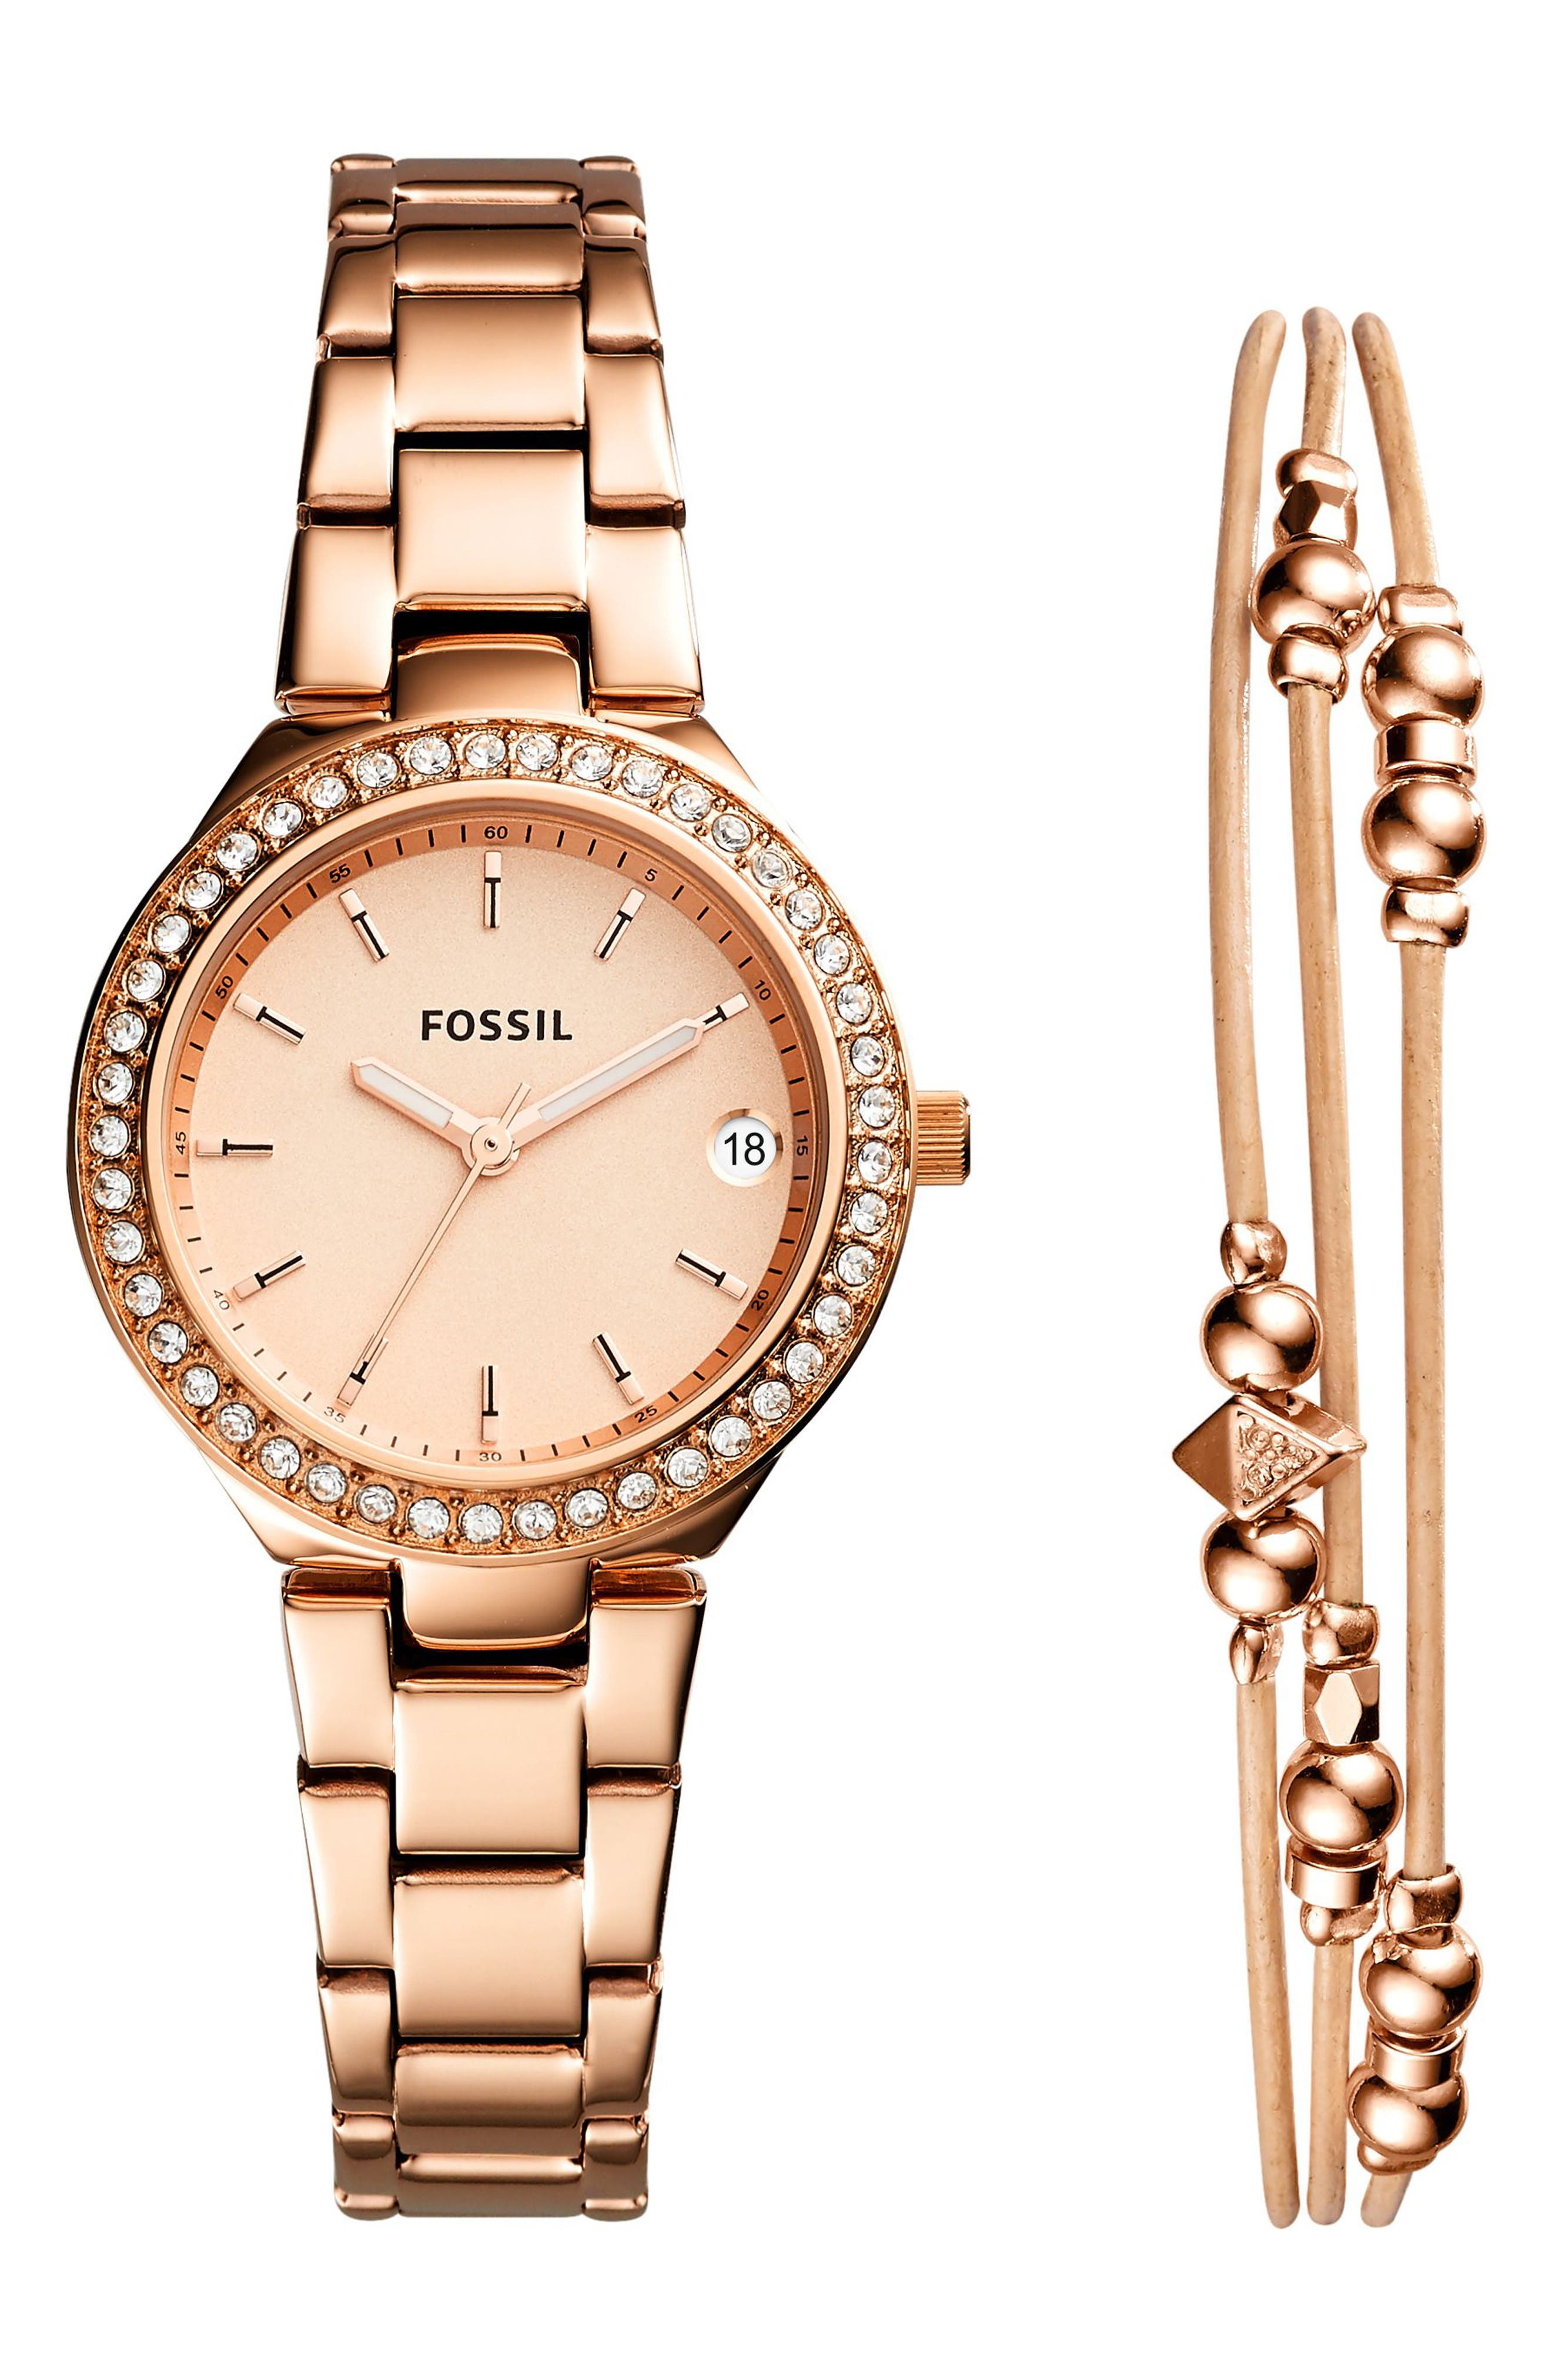 Main Image - Fossil Blane Crystal Bracelet Watch & Bracelet Set, 31mm